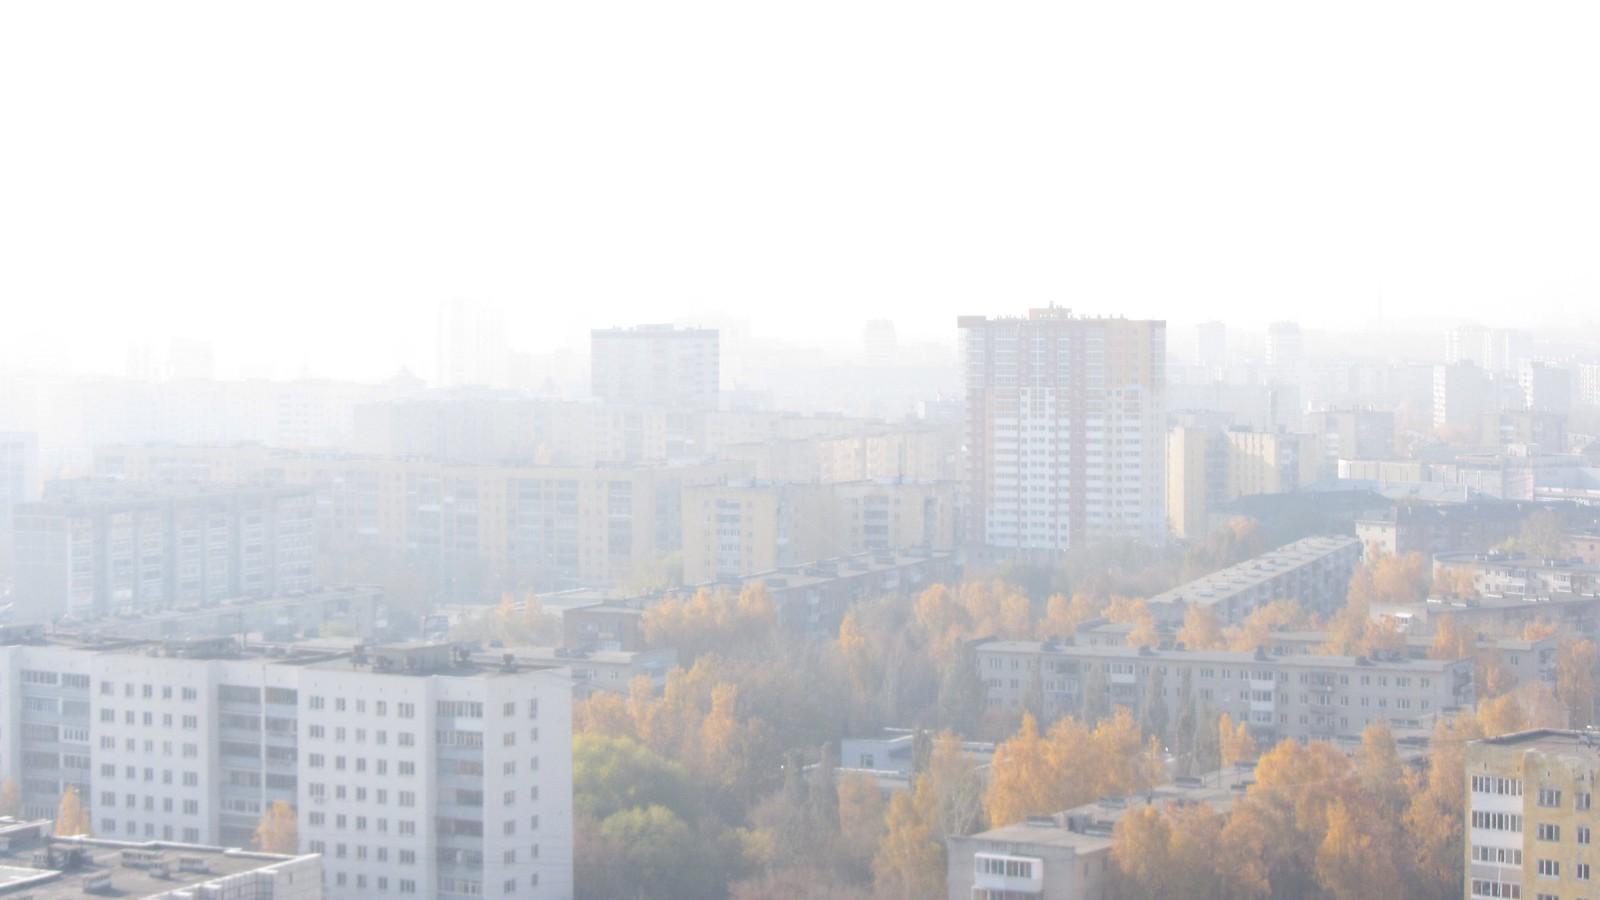 City view through dense smog on a sunny autumn day